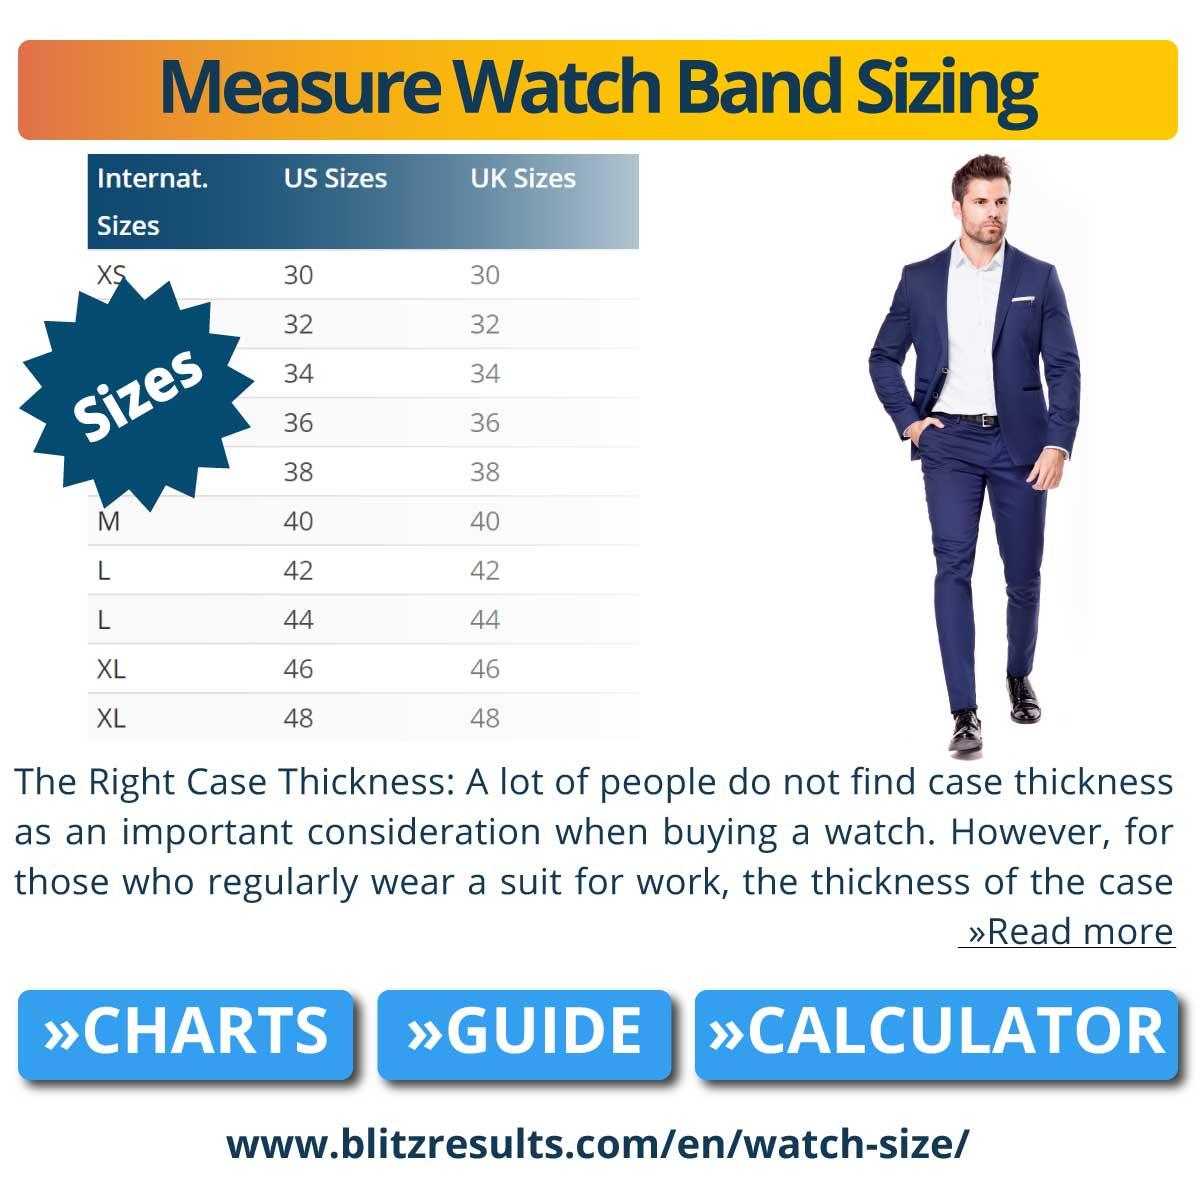 Measure Watch Band Sizing